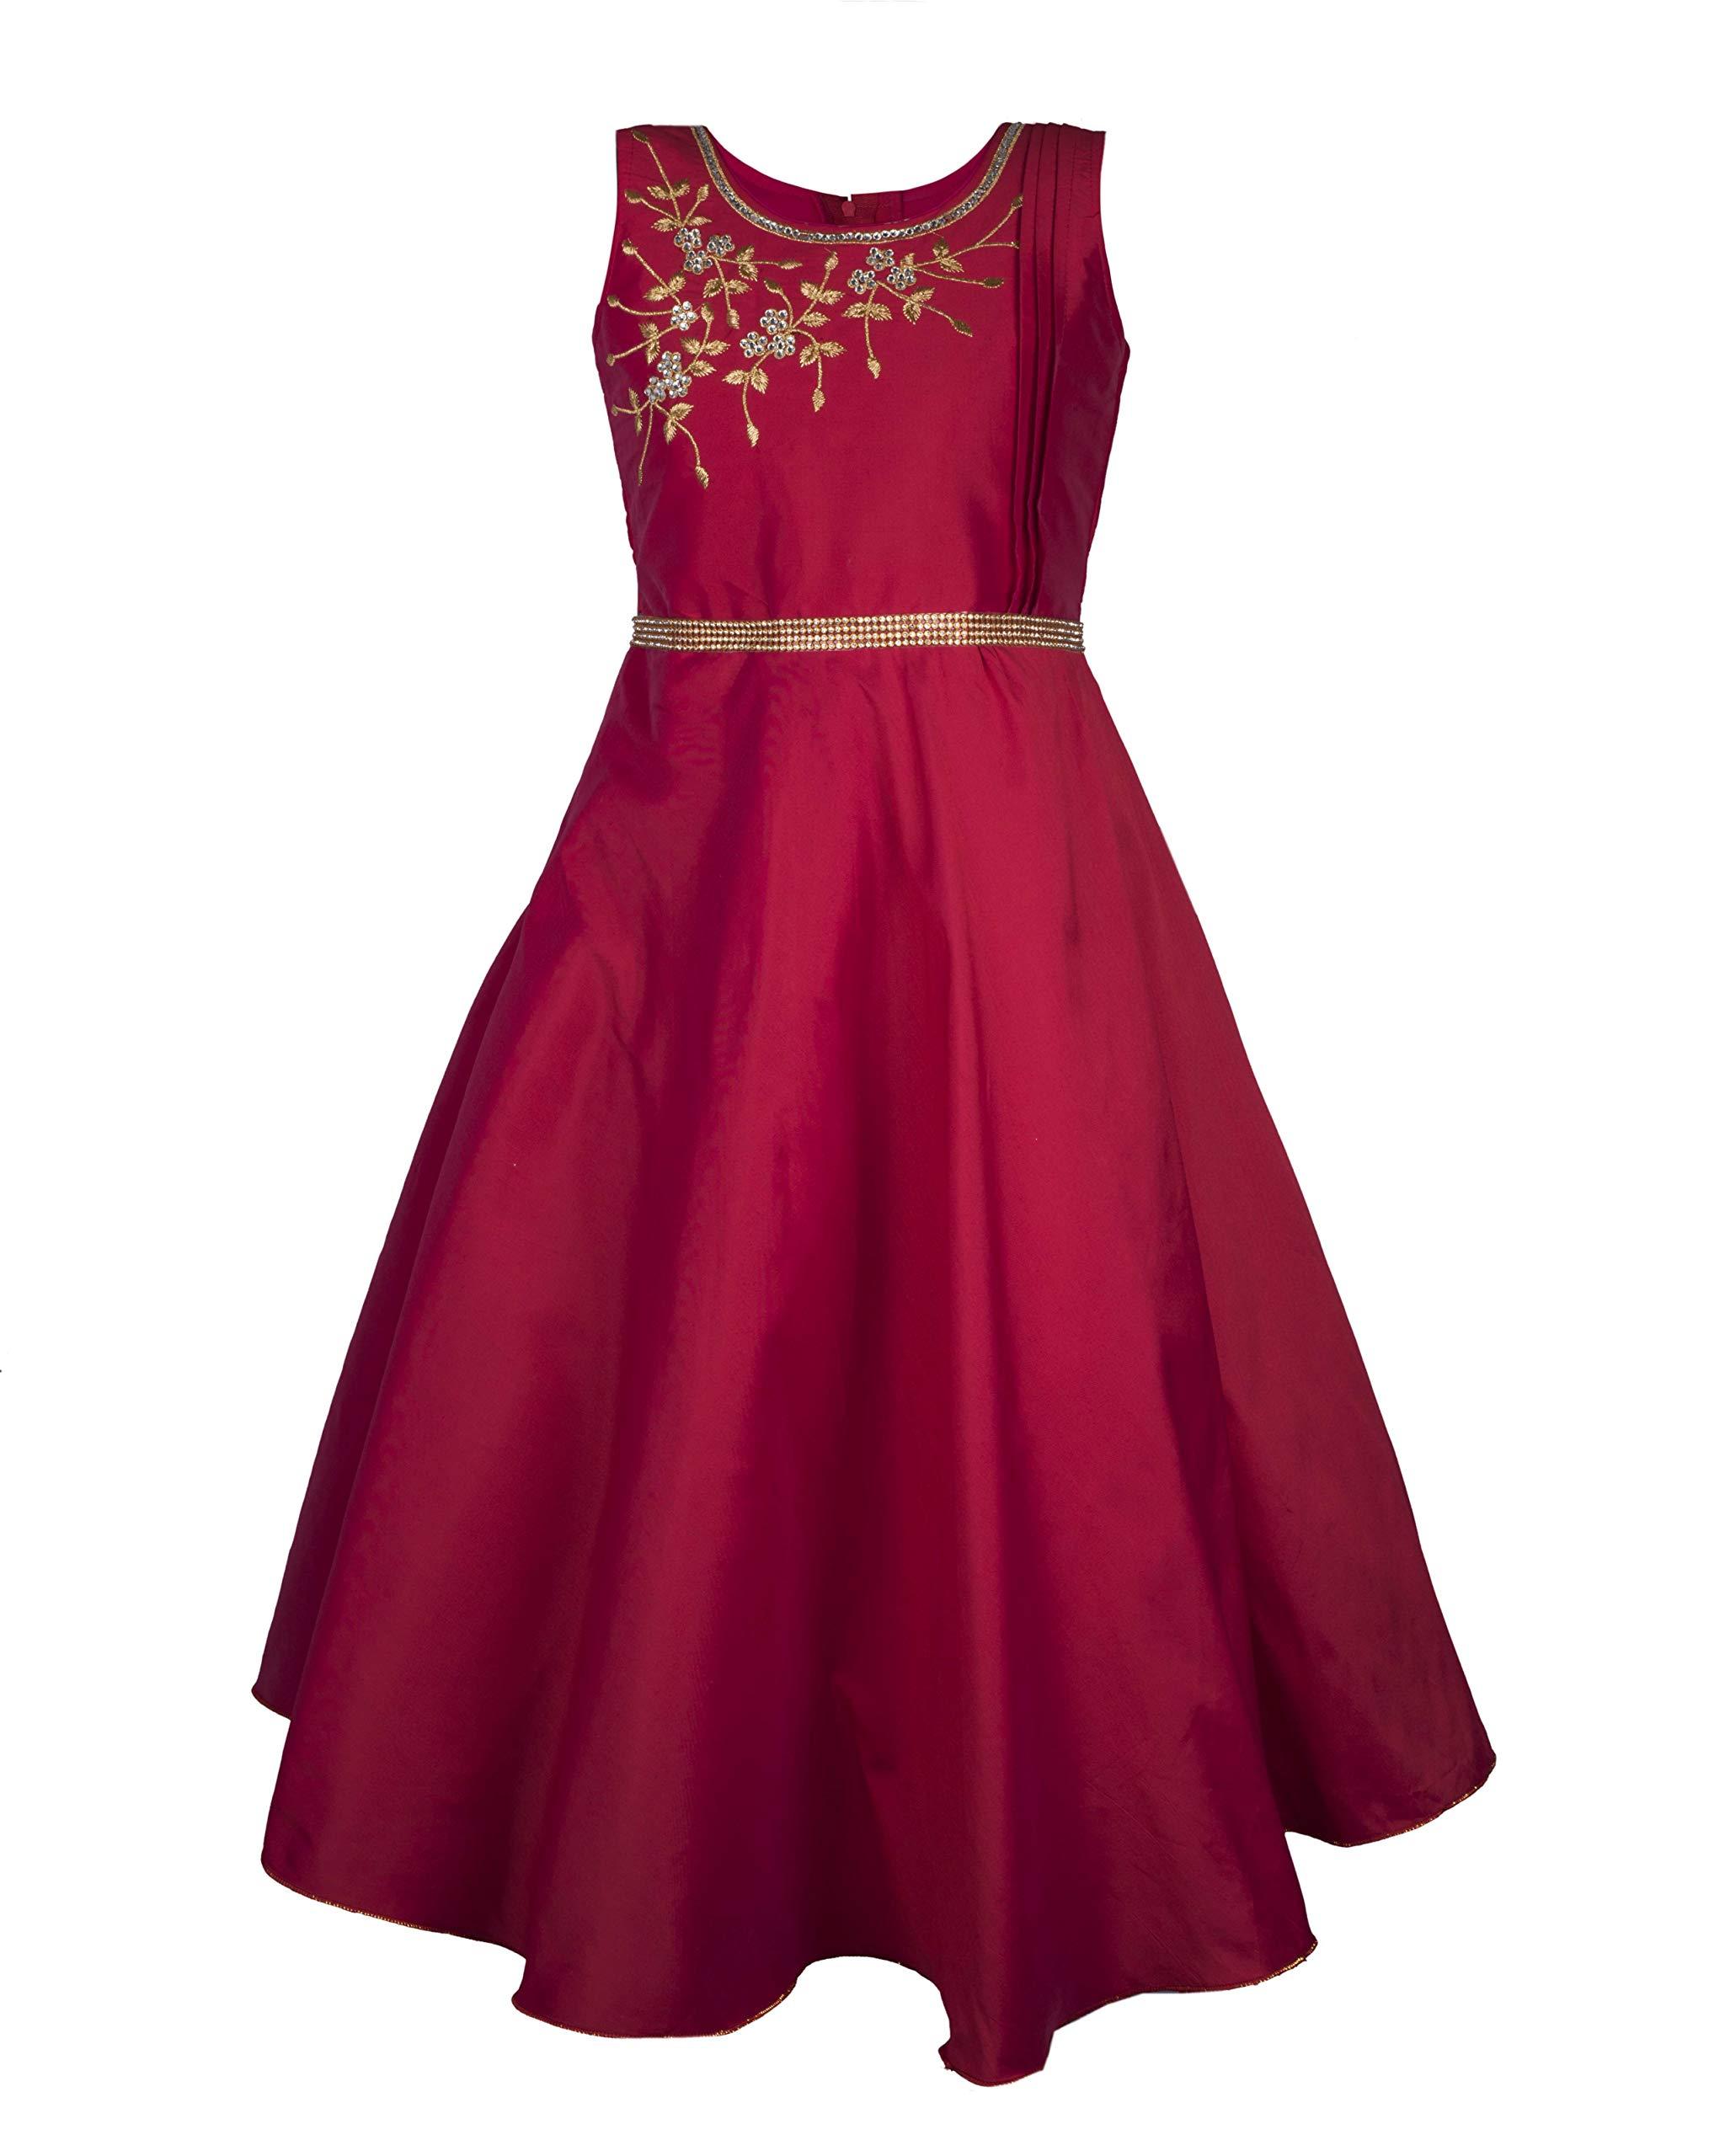 563103fc7eba My Lil Princess Baby Girl's Silk Frock Dress - lali mix india